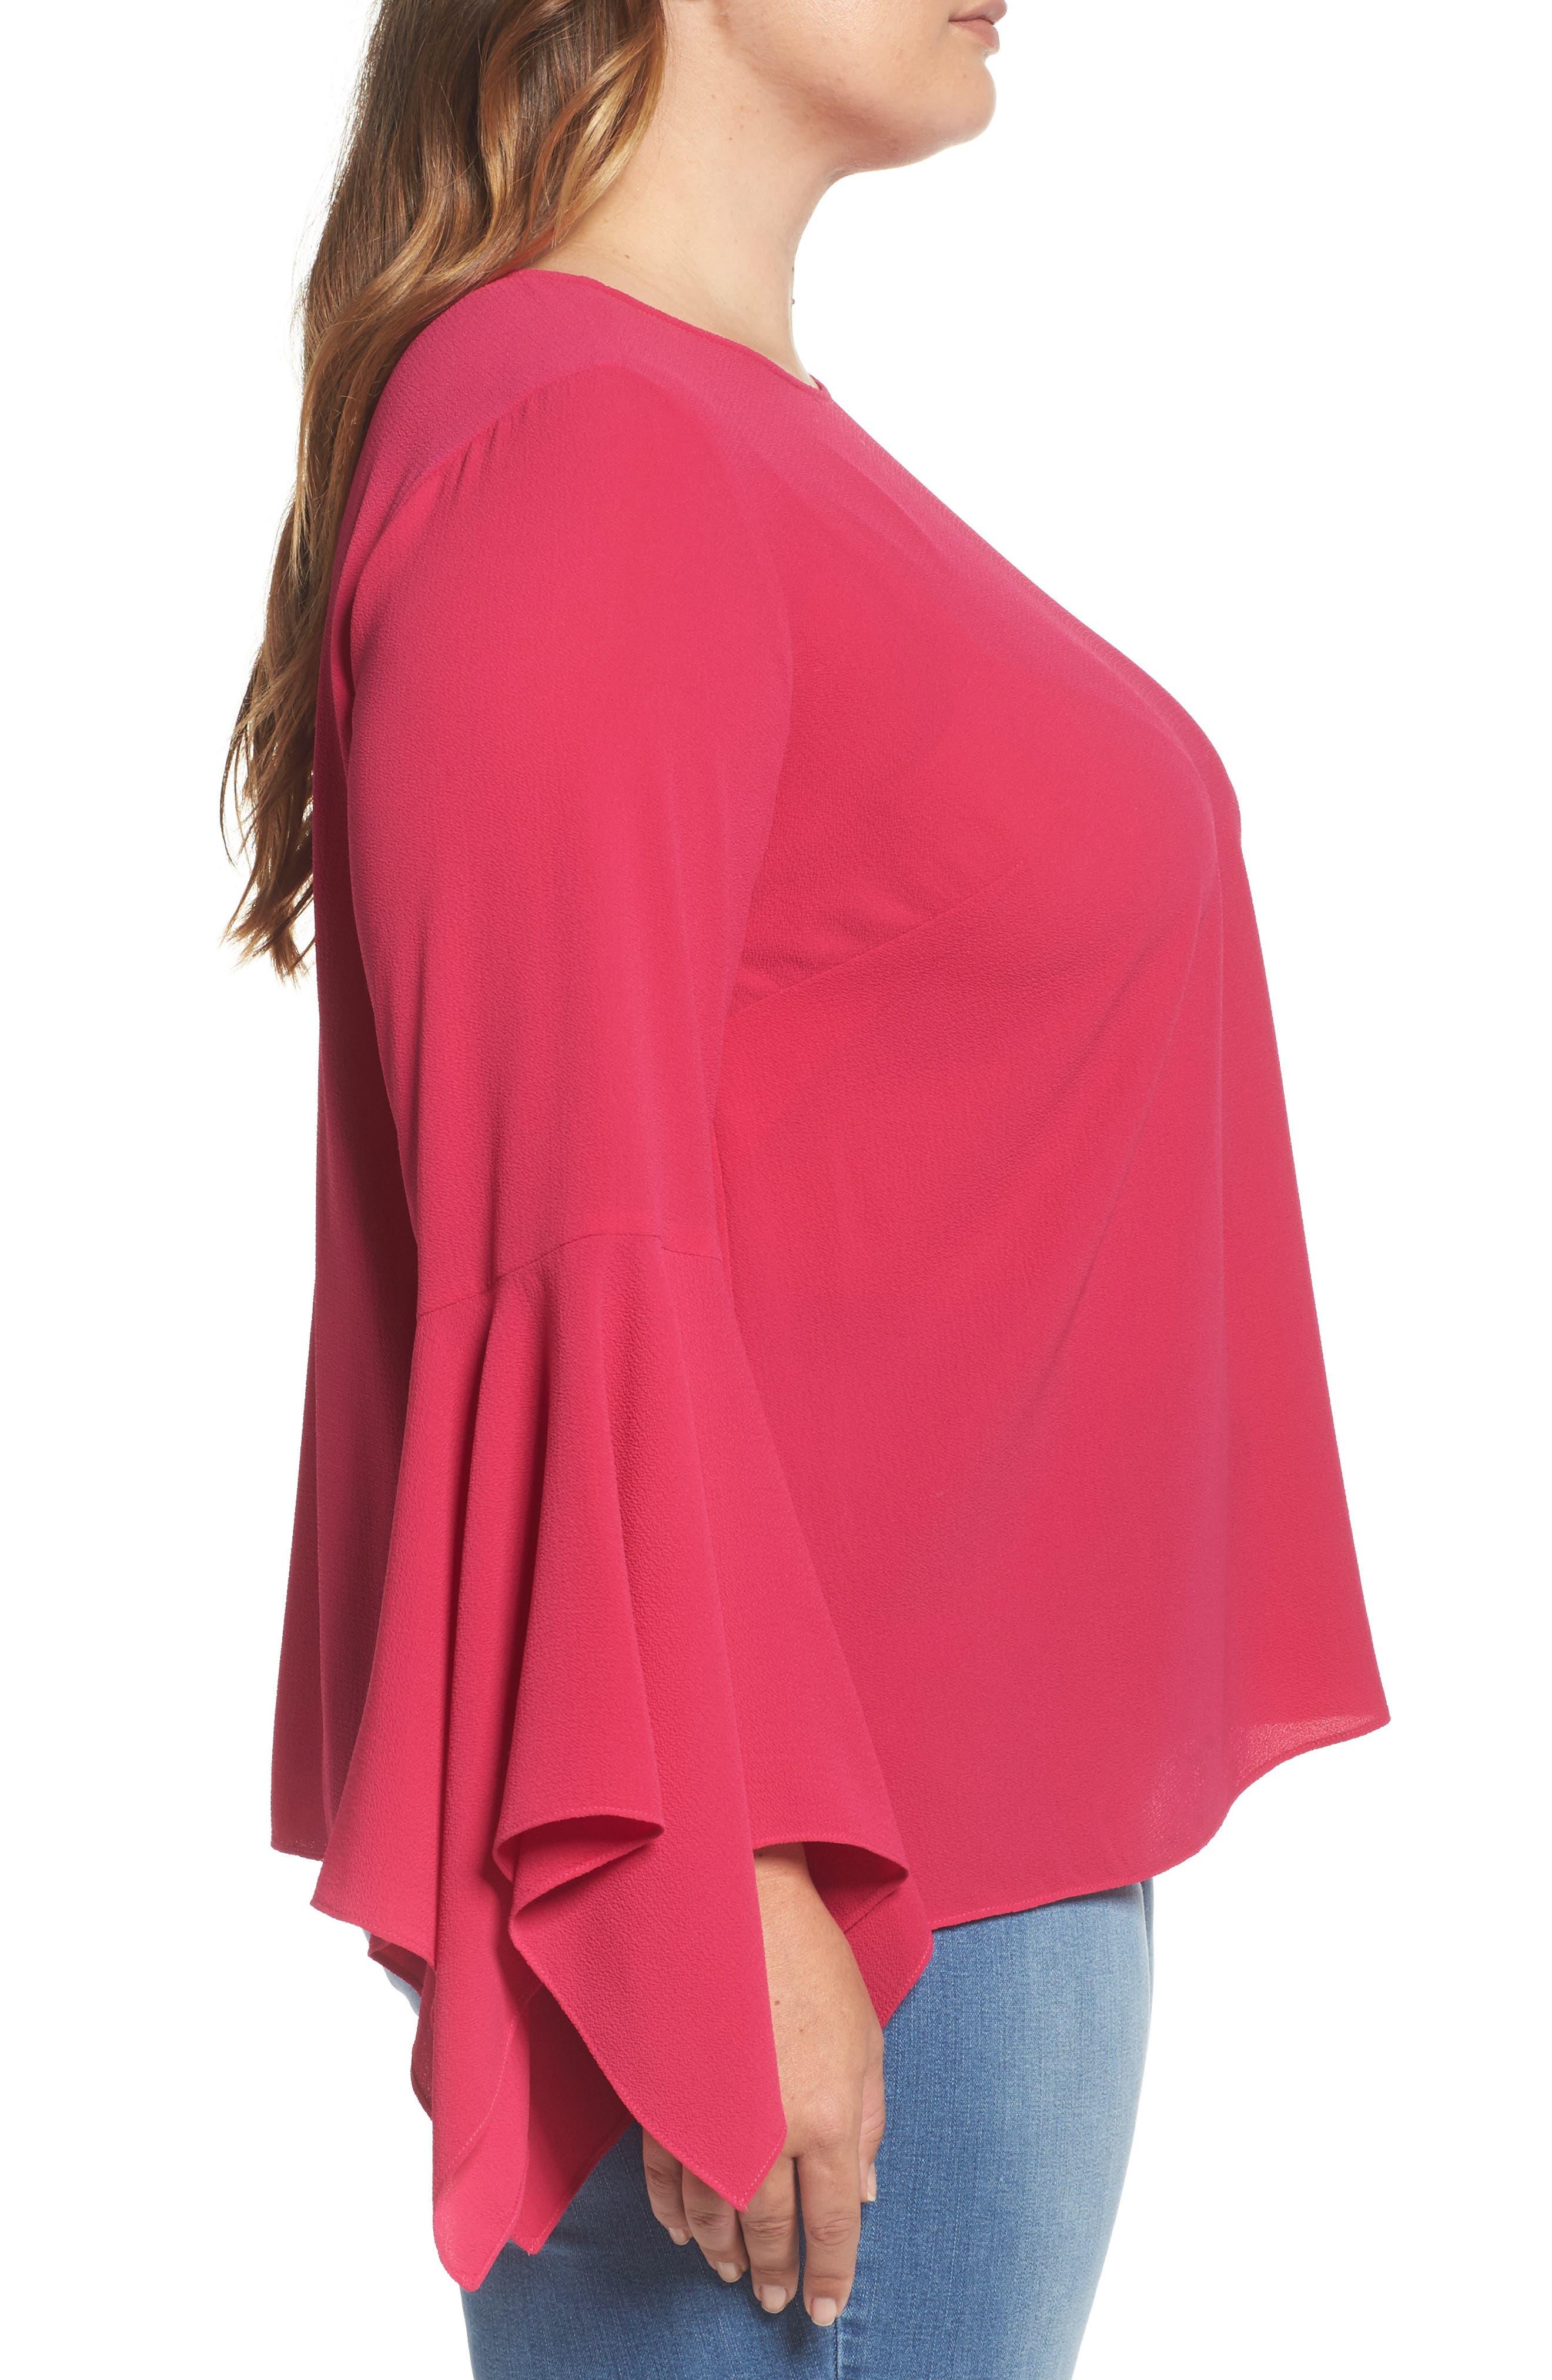 Alternate Image 3  - Vince Camuto Handkerchief Sleeve Blouse (Plus Size)